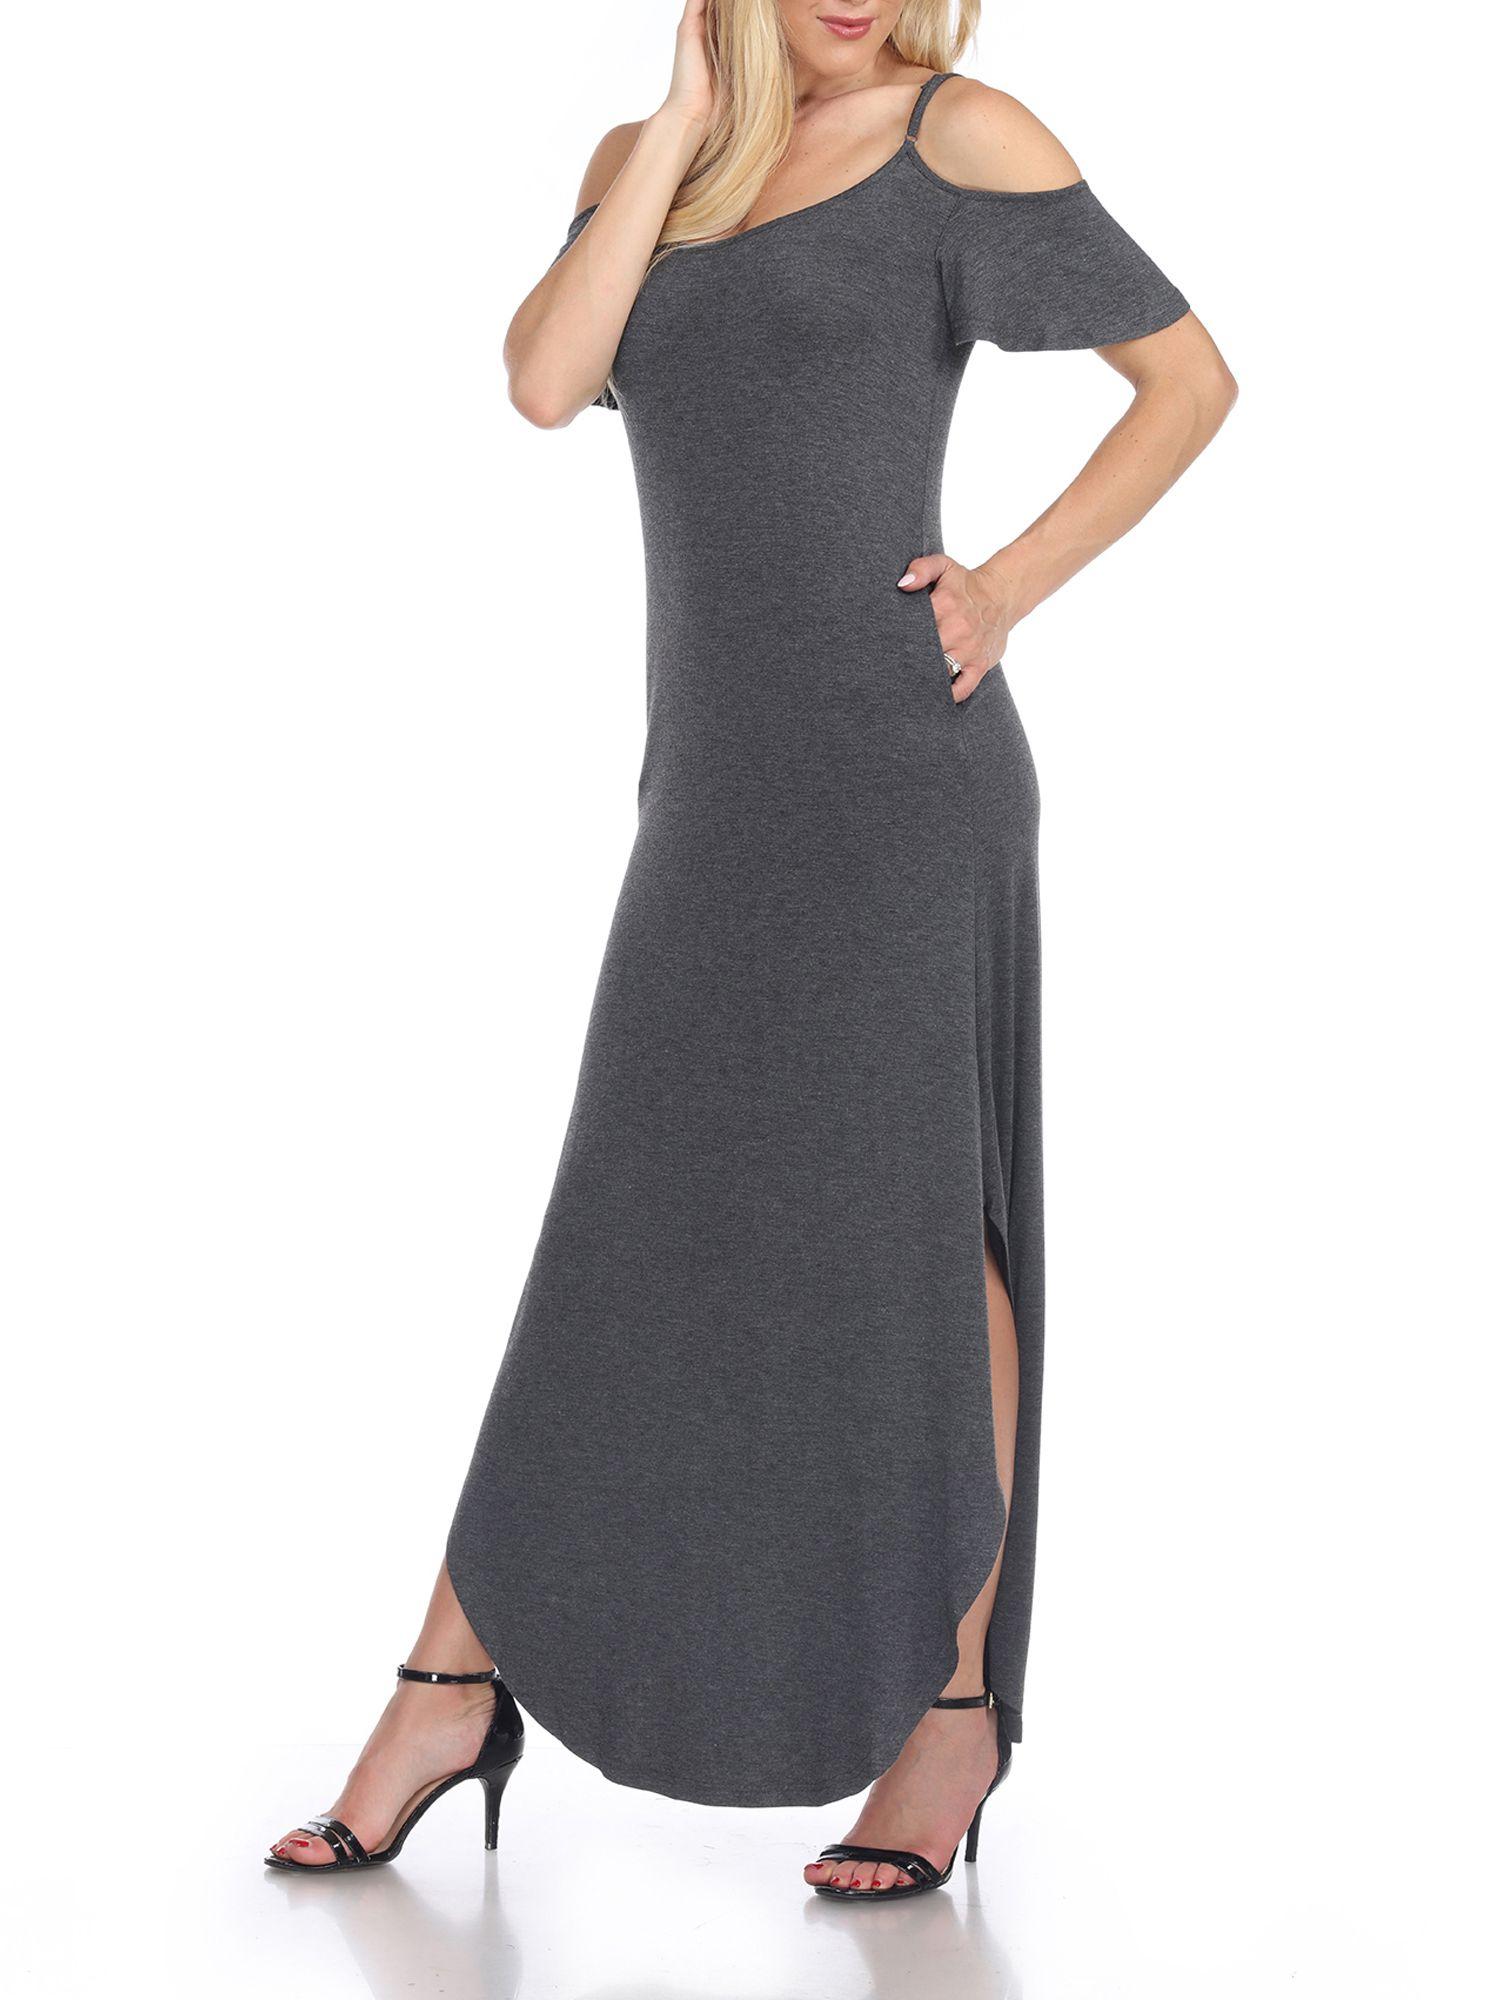 White Mark White Mark Women S Lexi Maxi Dress Walmart Com Dresses Maxi Dress Versatile Dresses [ 2000 x 1500 Pixel ]